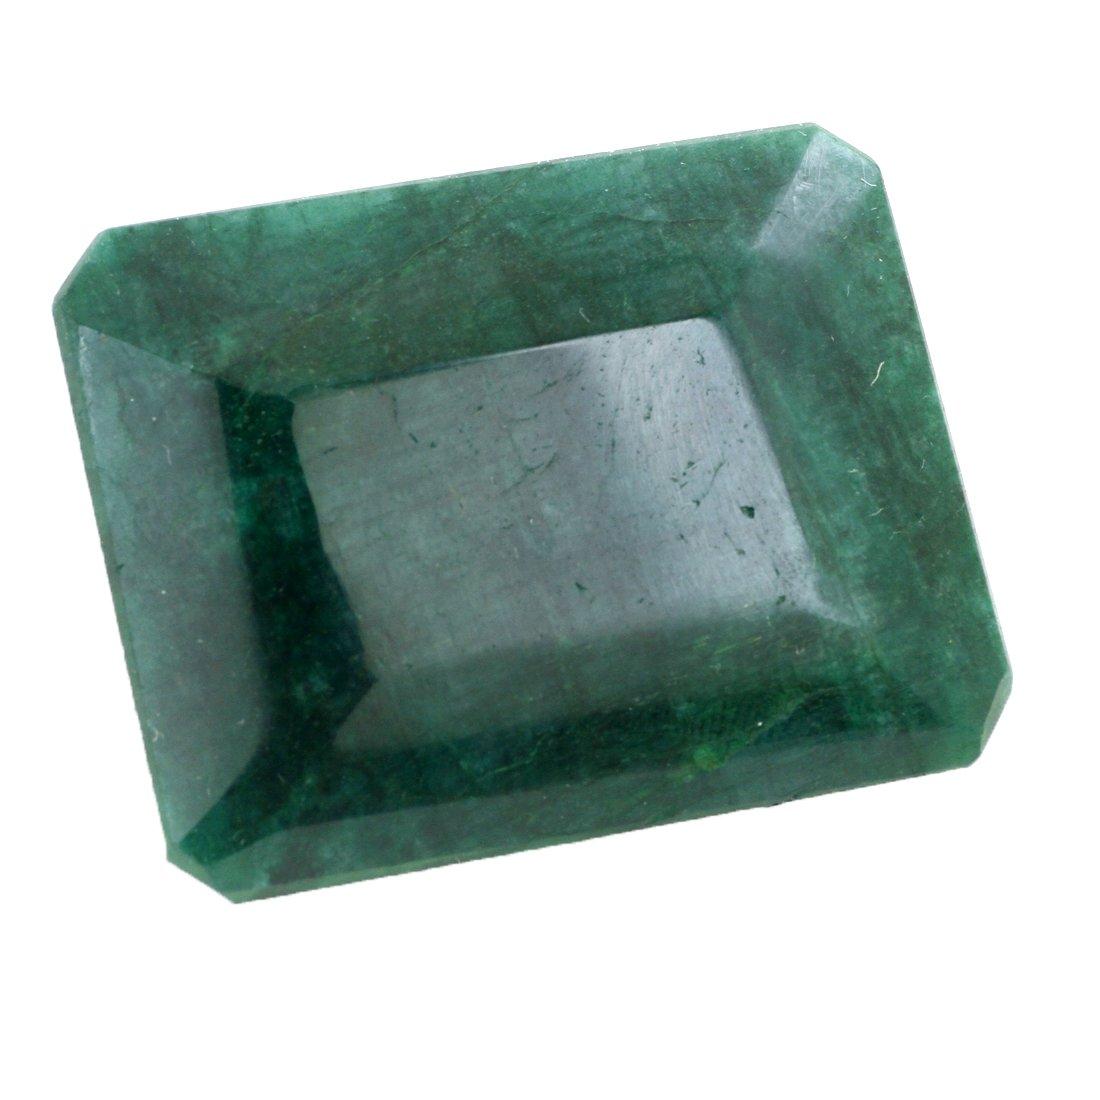 skyjewels認定300 ctエメラルドファセットグリーンエメラルドLoose宝石   B075Z5D1FD